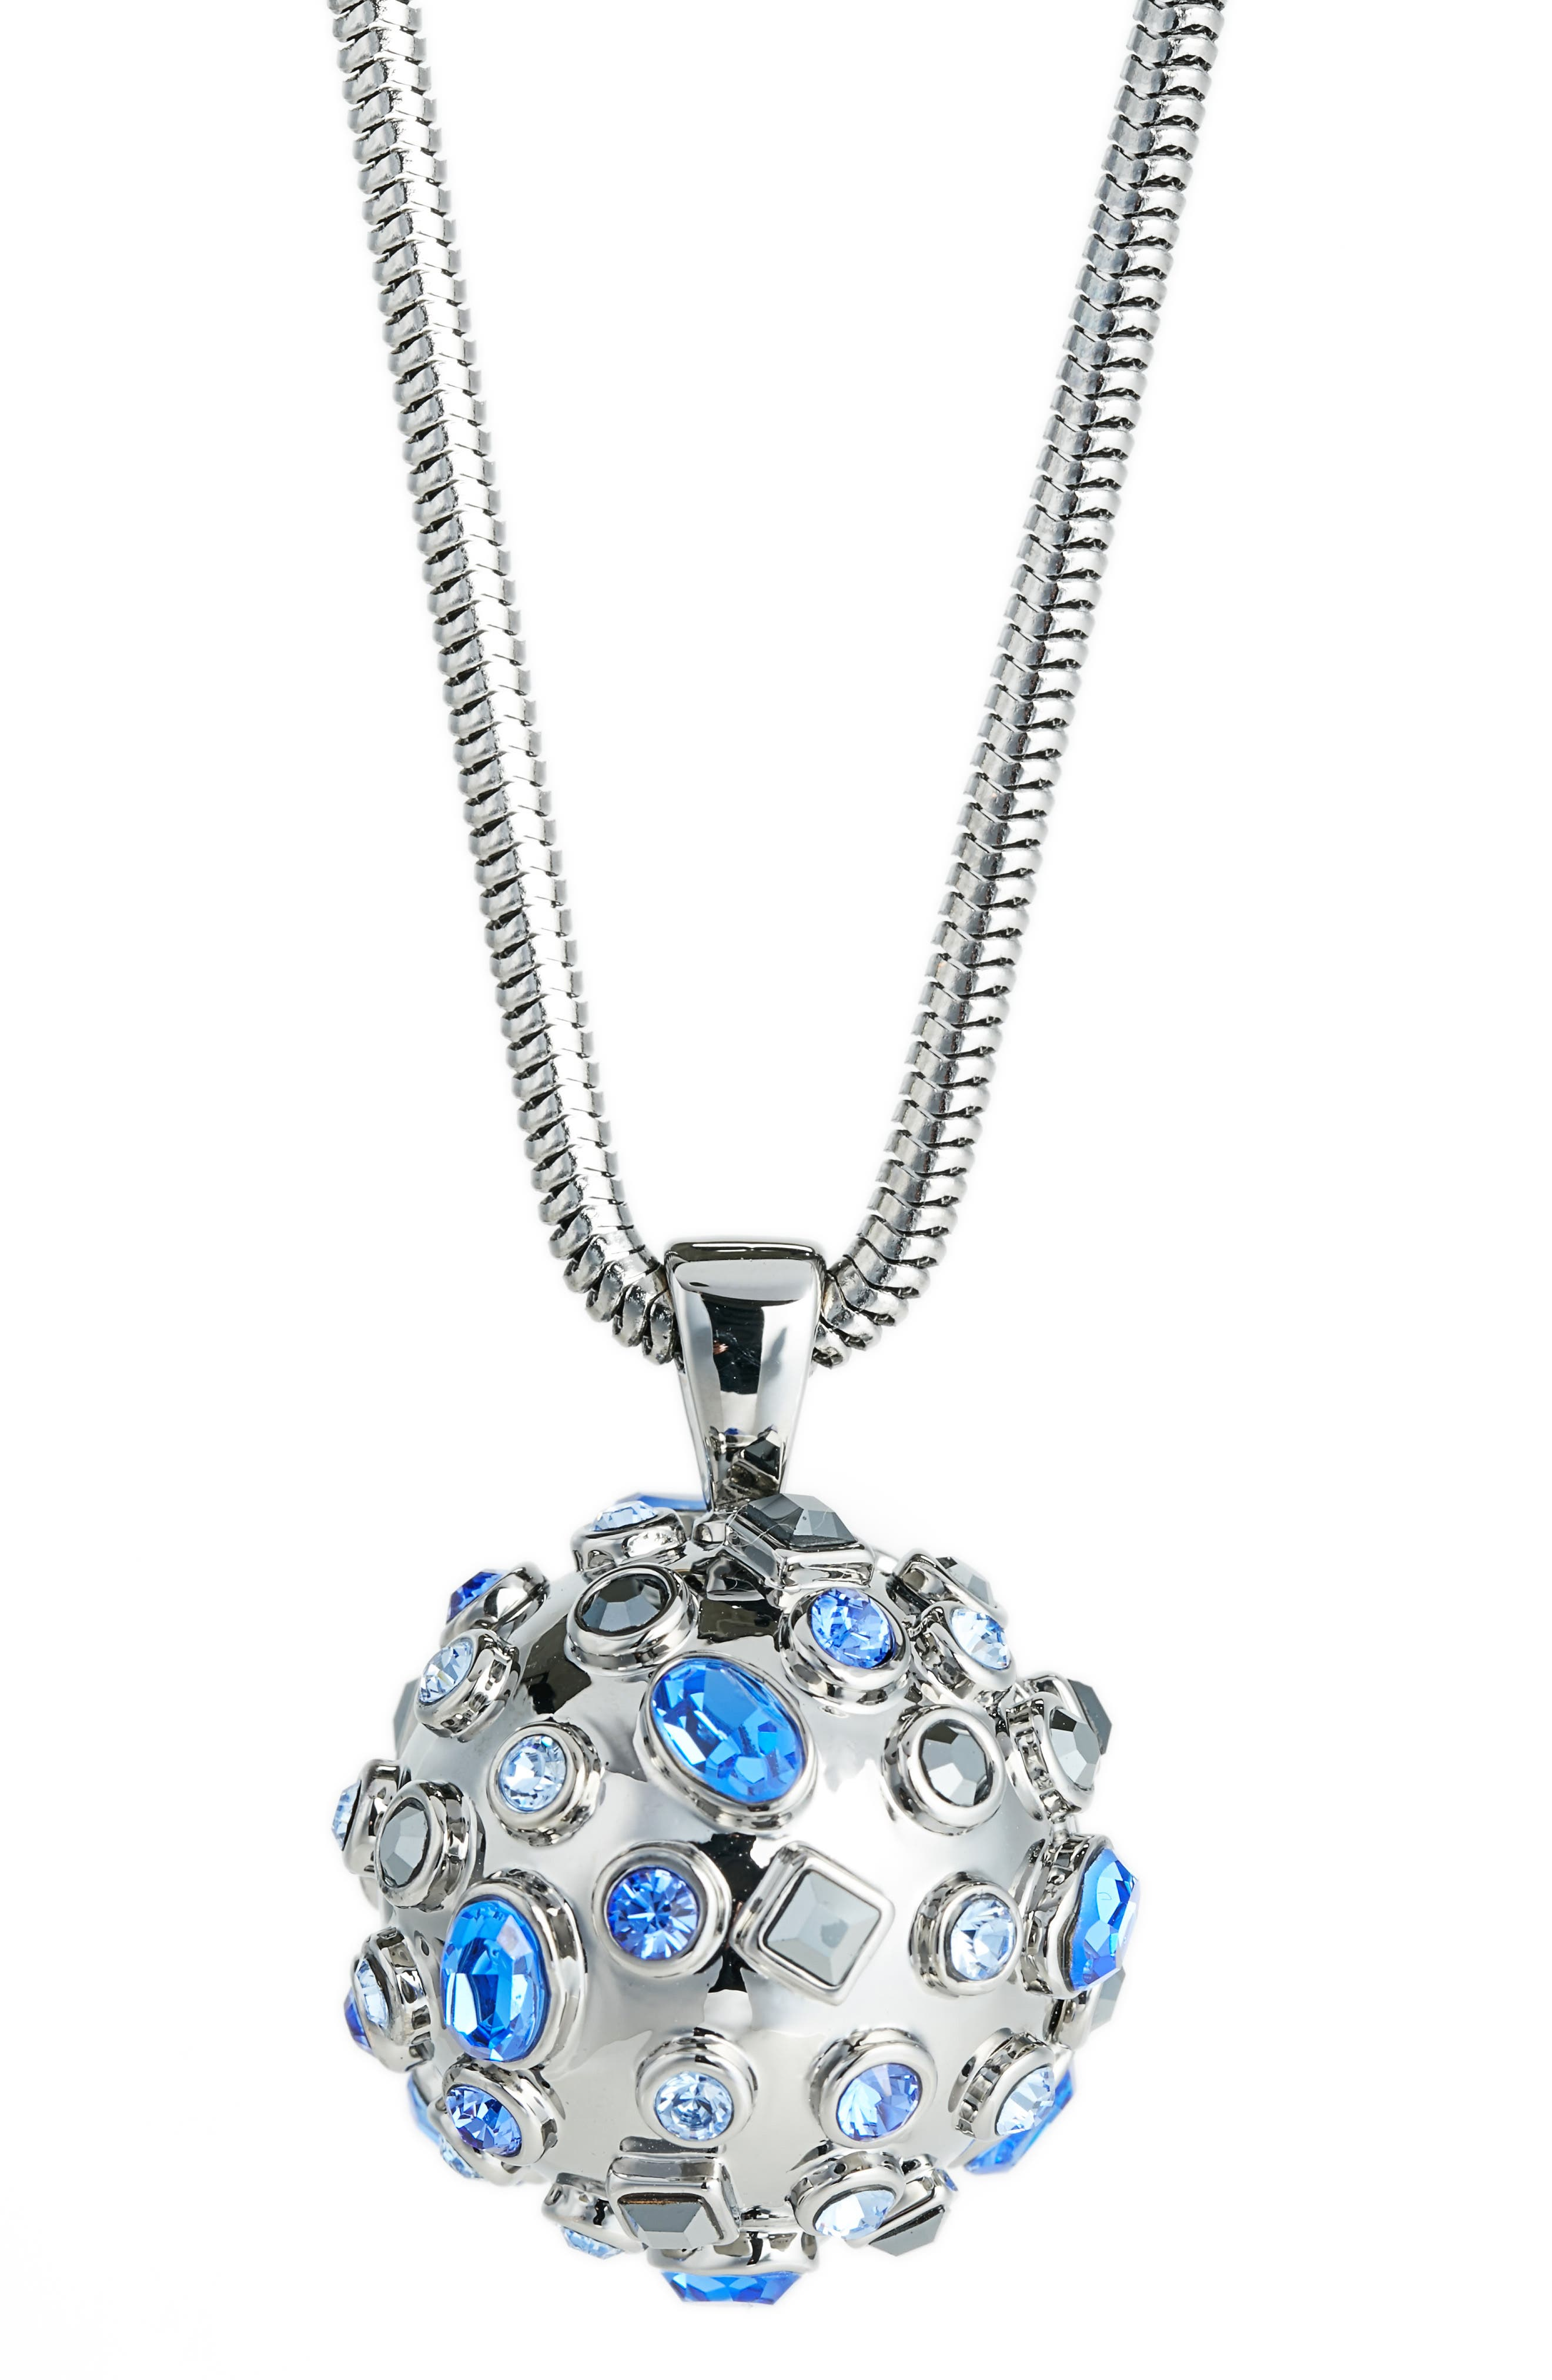 Swarovski Crystal Pendant Necklace,                             Main thumbnail 1, color,                             Ruth Light Sapphire